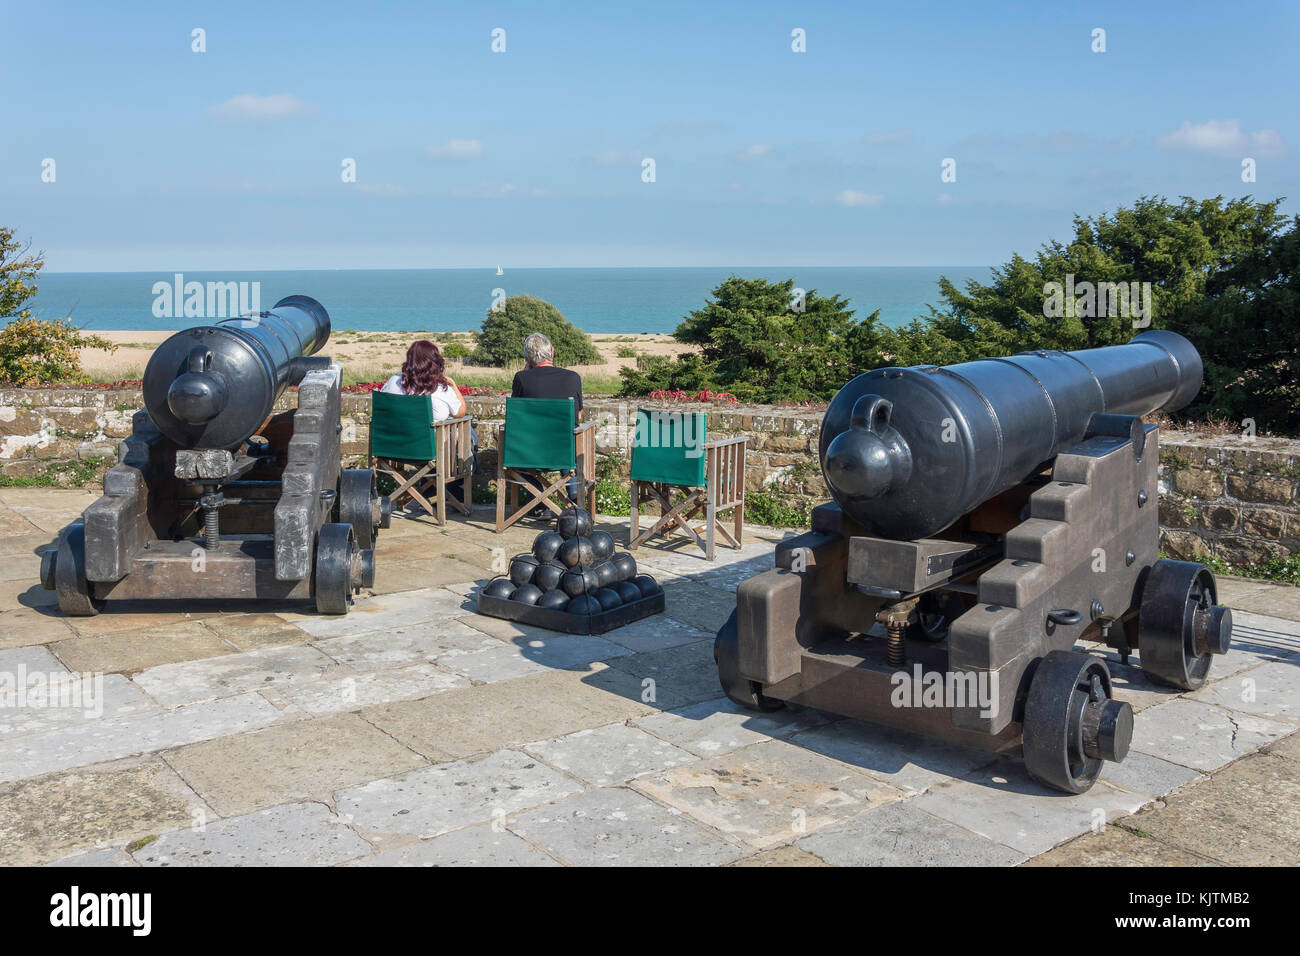 Cannons on castle's firing platform, Walmer Castle & Gardens, Kingsdown Road, Walmer, Deal, Kent, England, United Kingdom Stock Photo